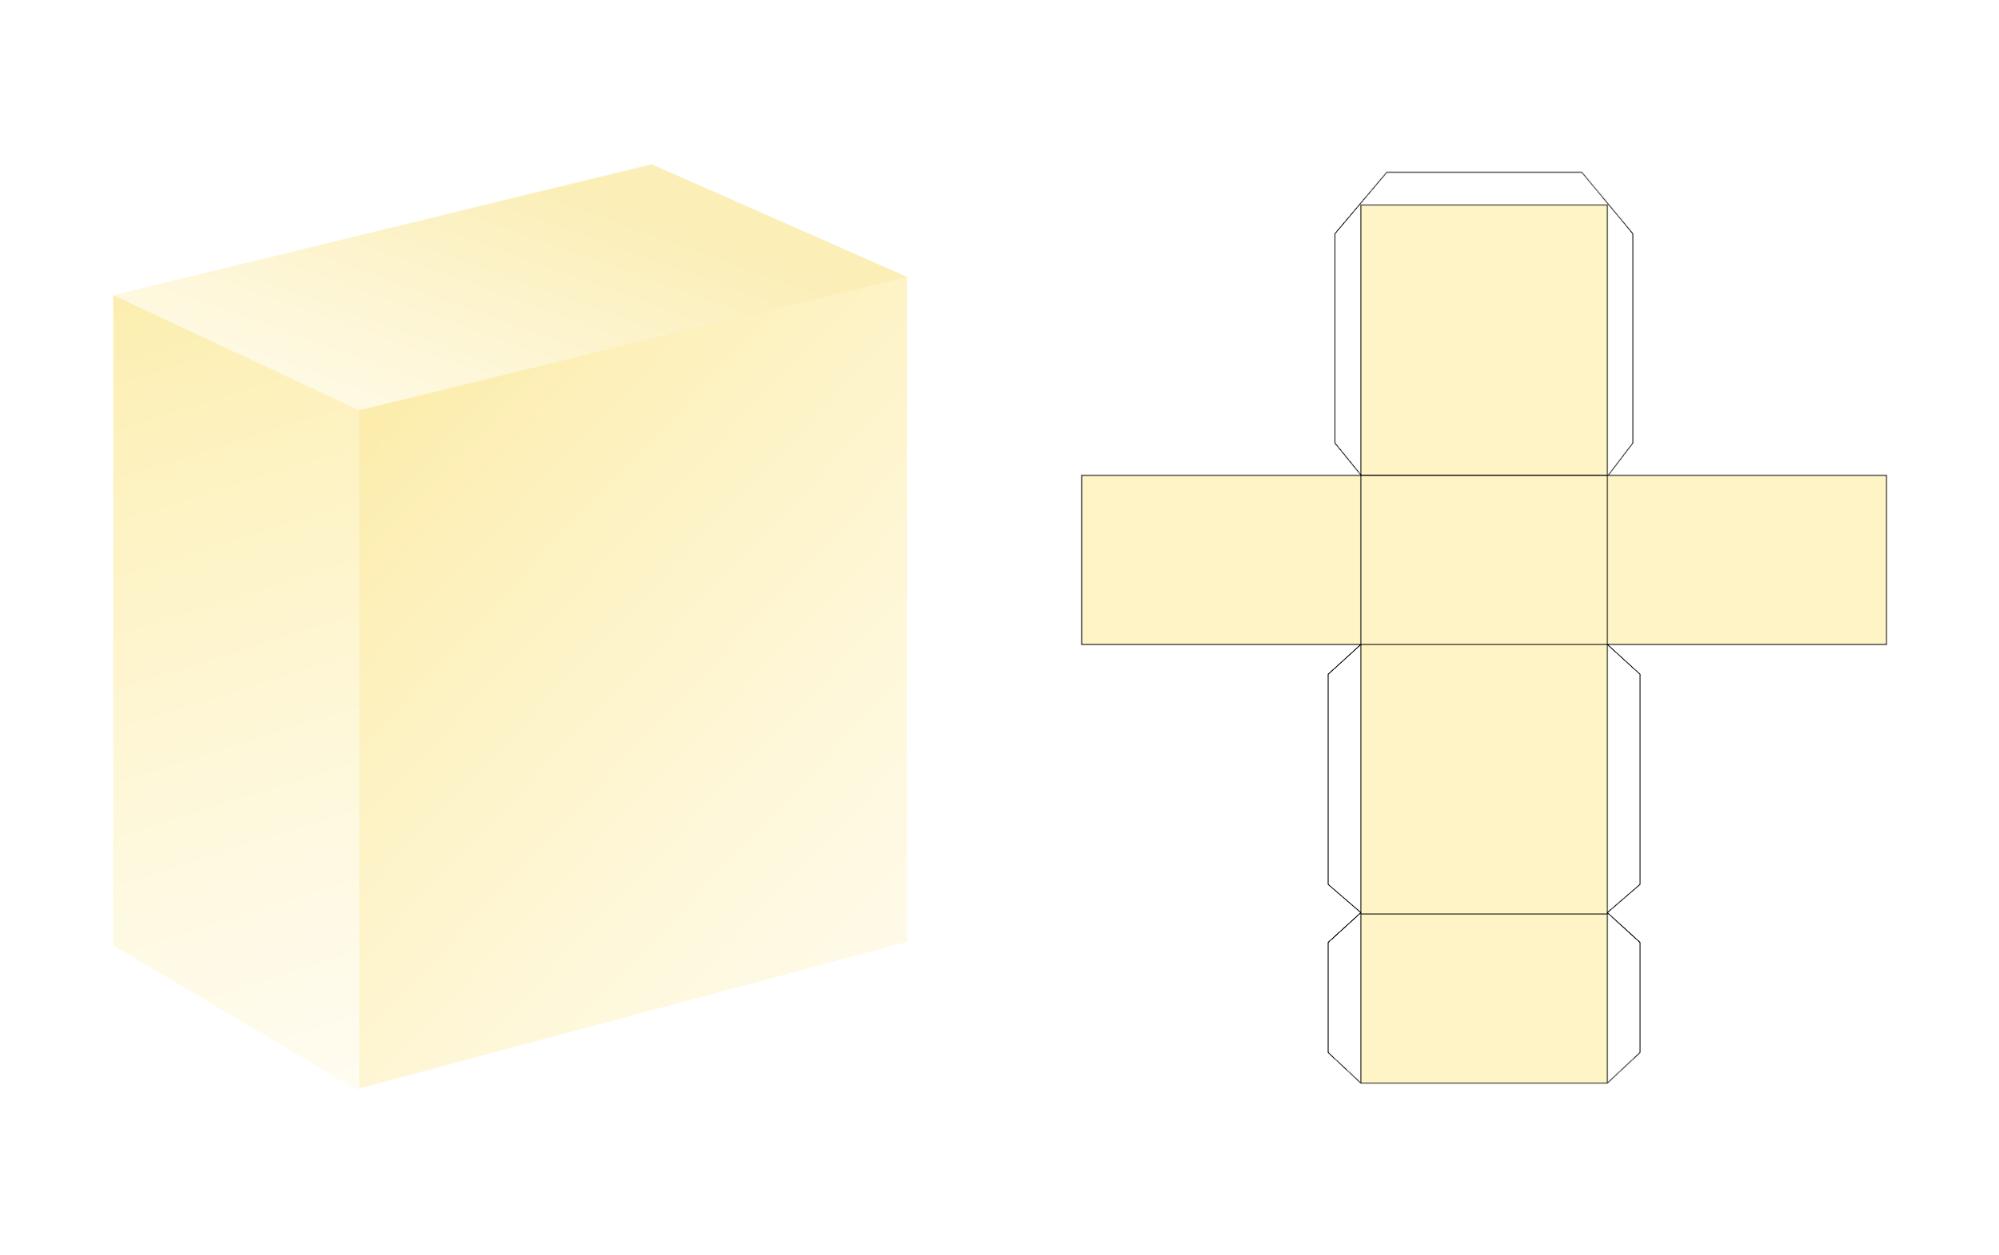 Прямоугольный параллелепипед 3